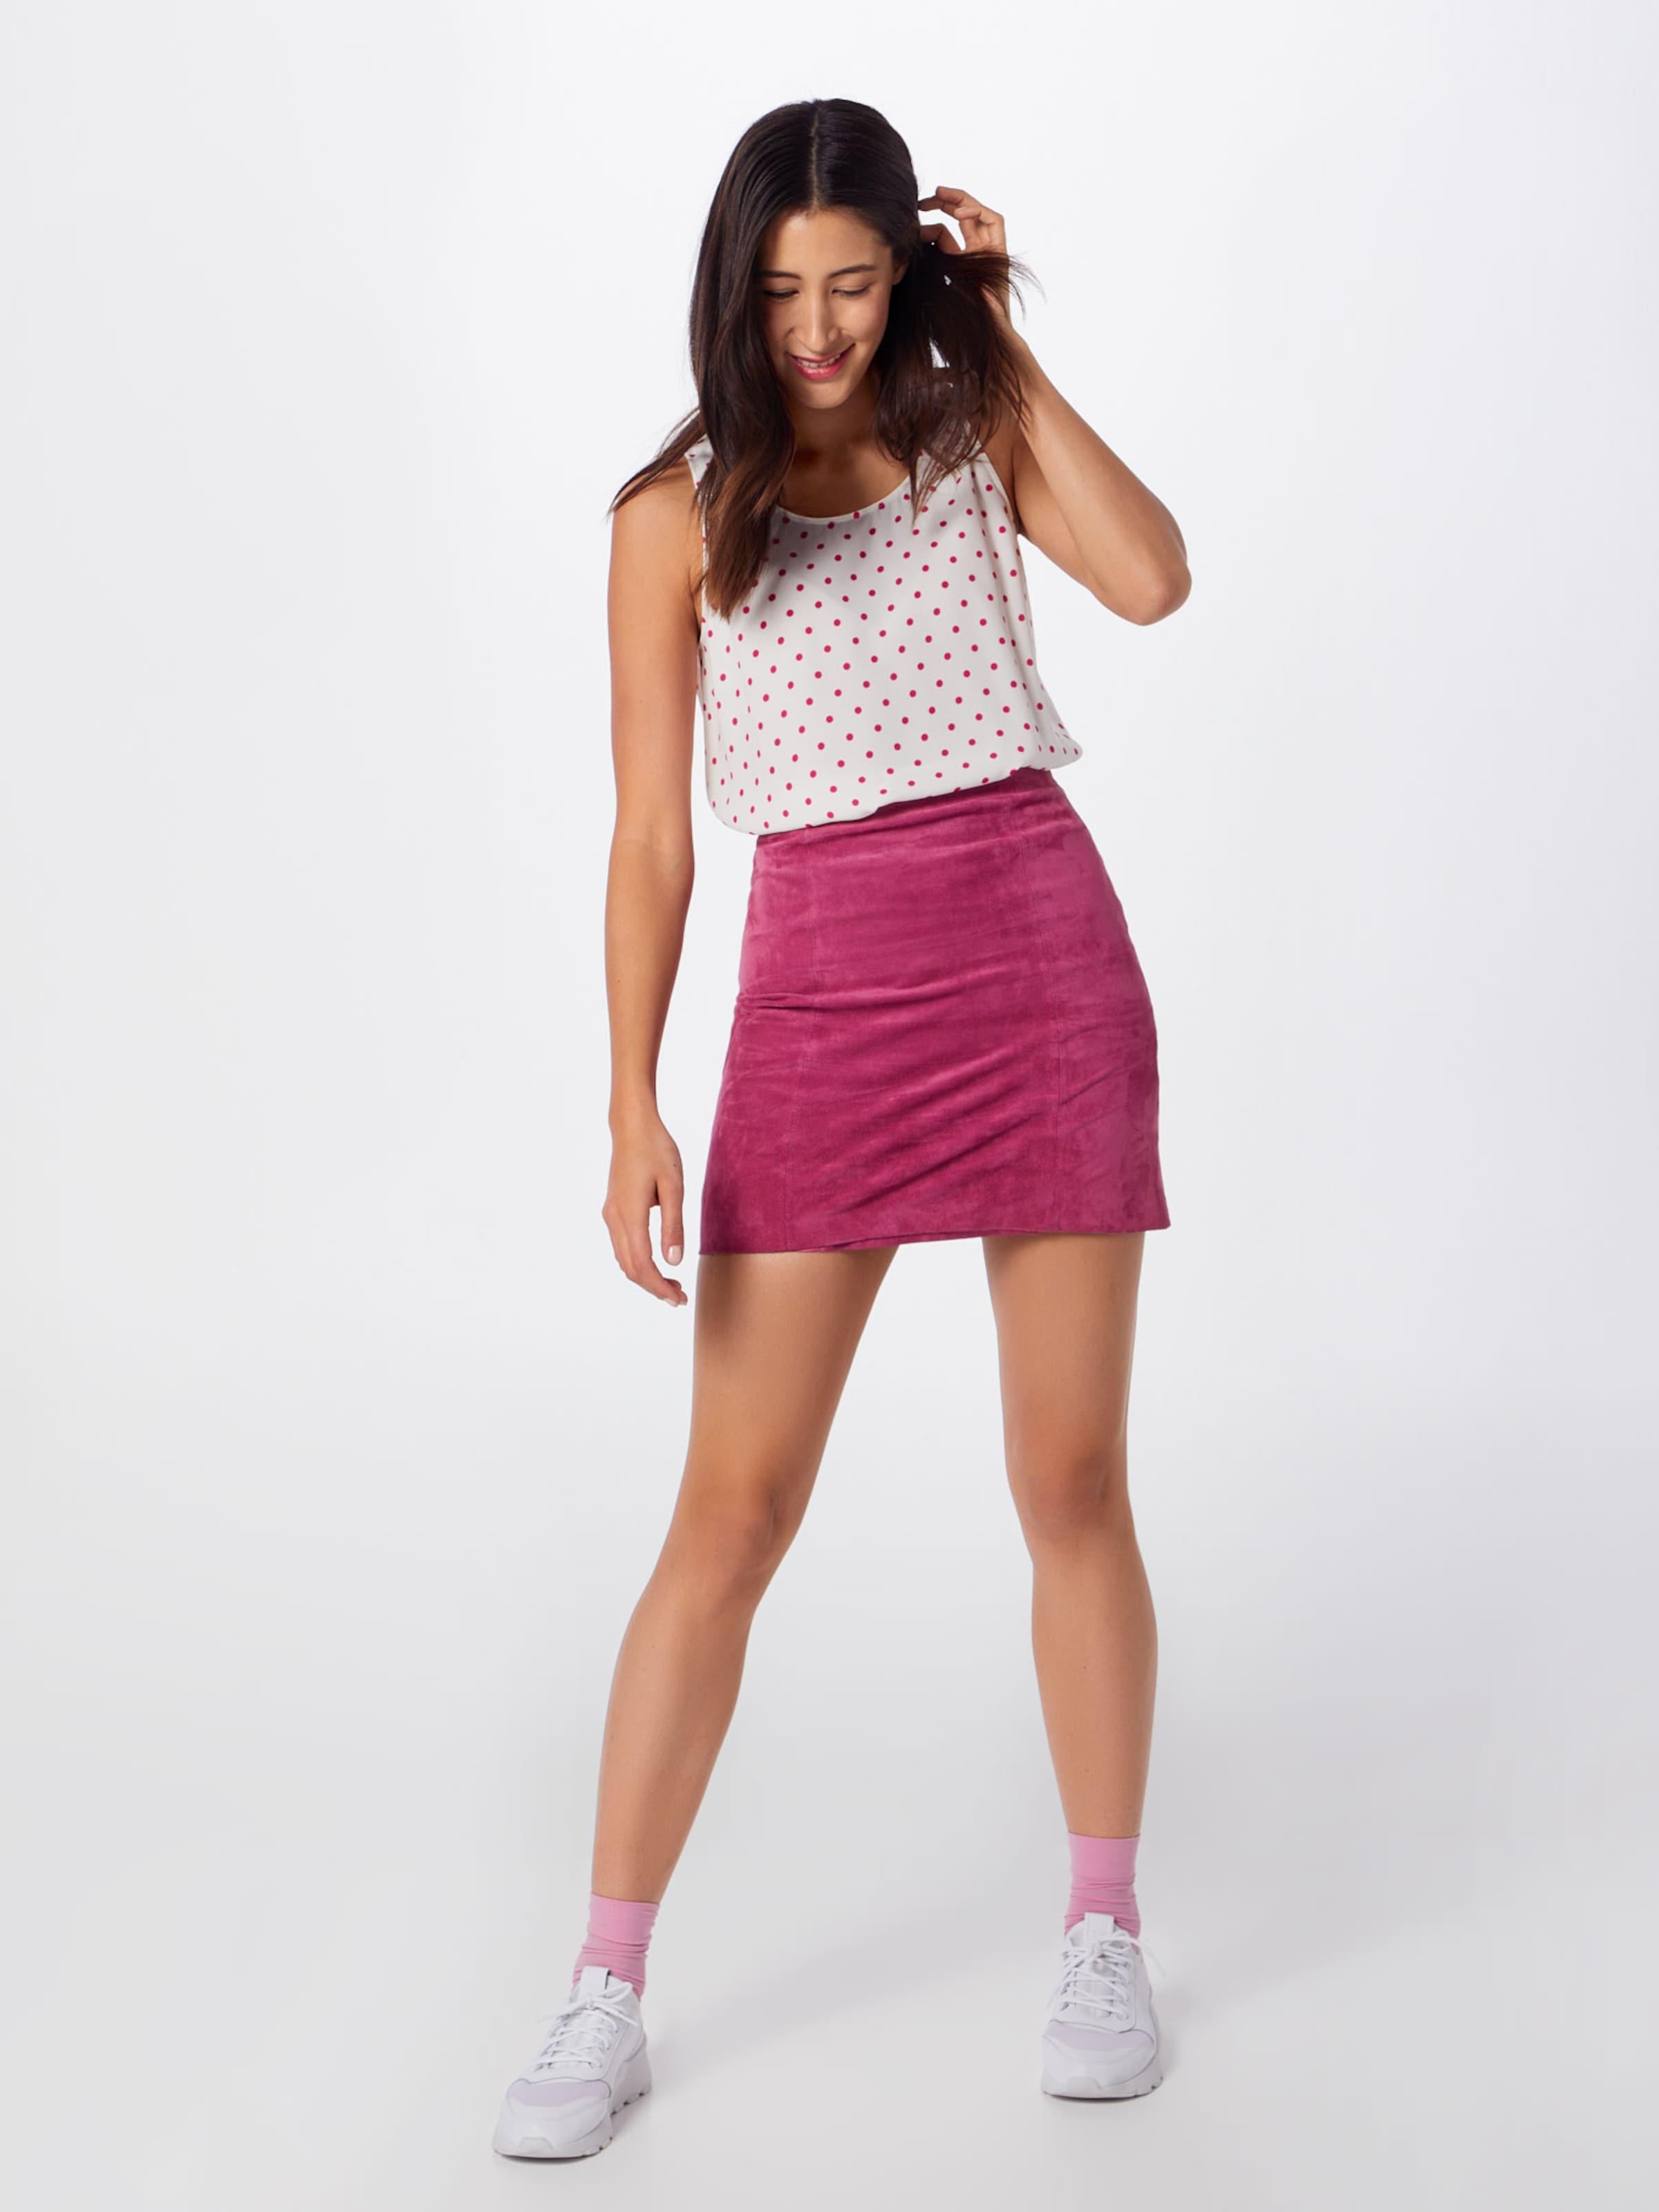 'enrical' Lieblingsstück Lieblingsstück In Top Top Lieblingsstück PinkWit Top 'enrical' In PinkWit 'enrical' eW9Yb2EDHI